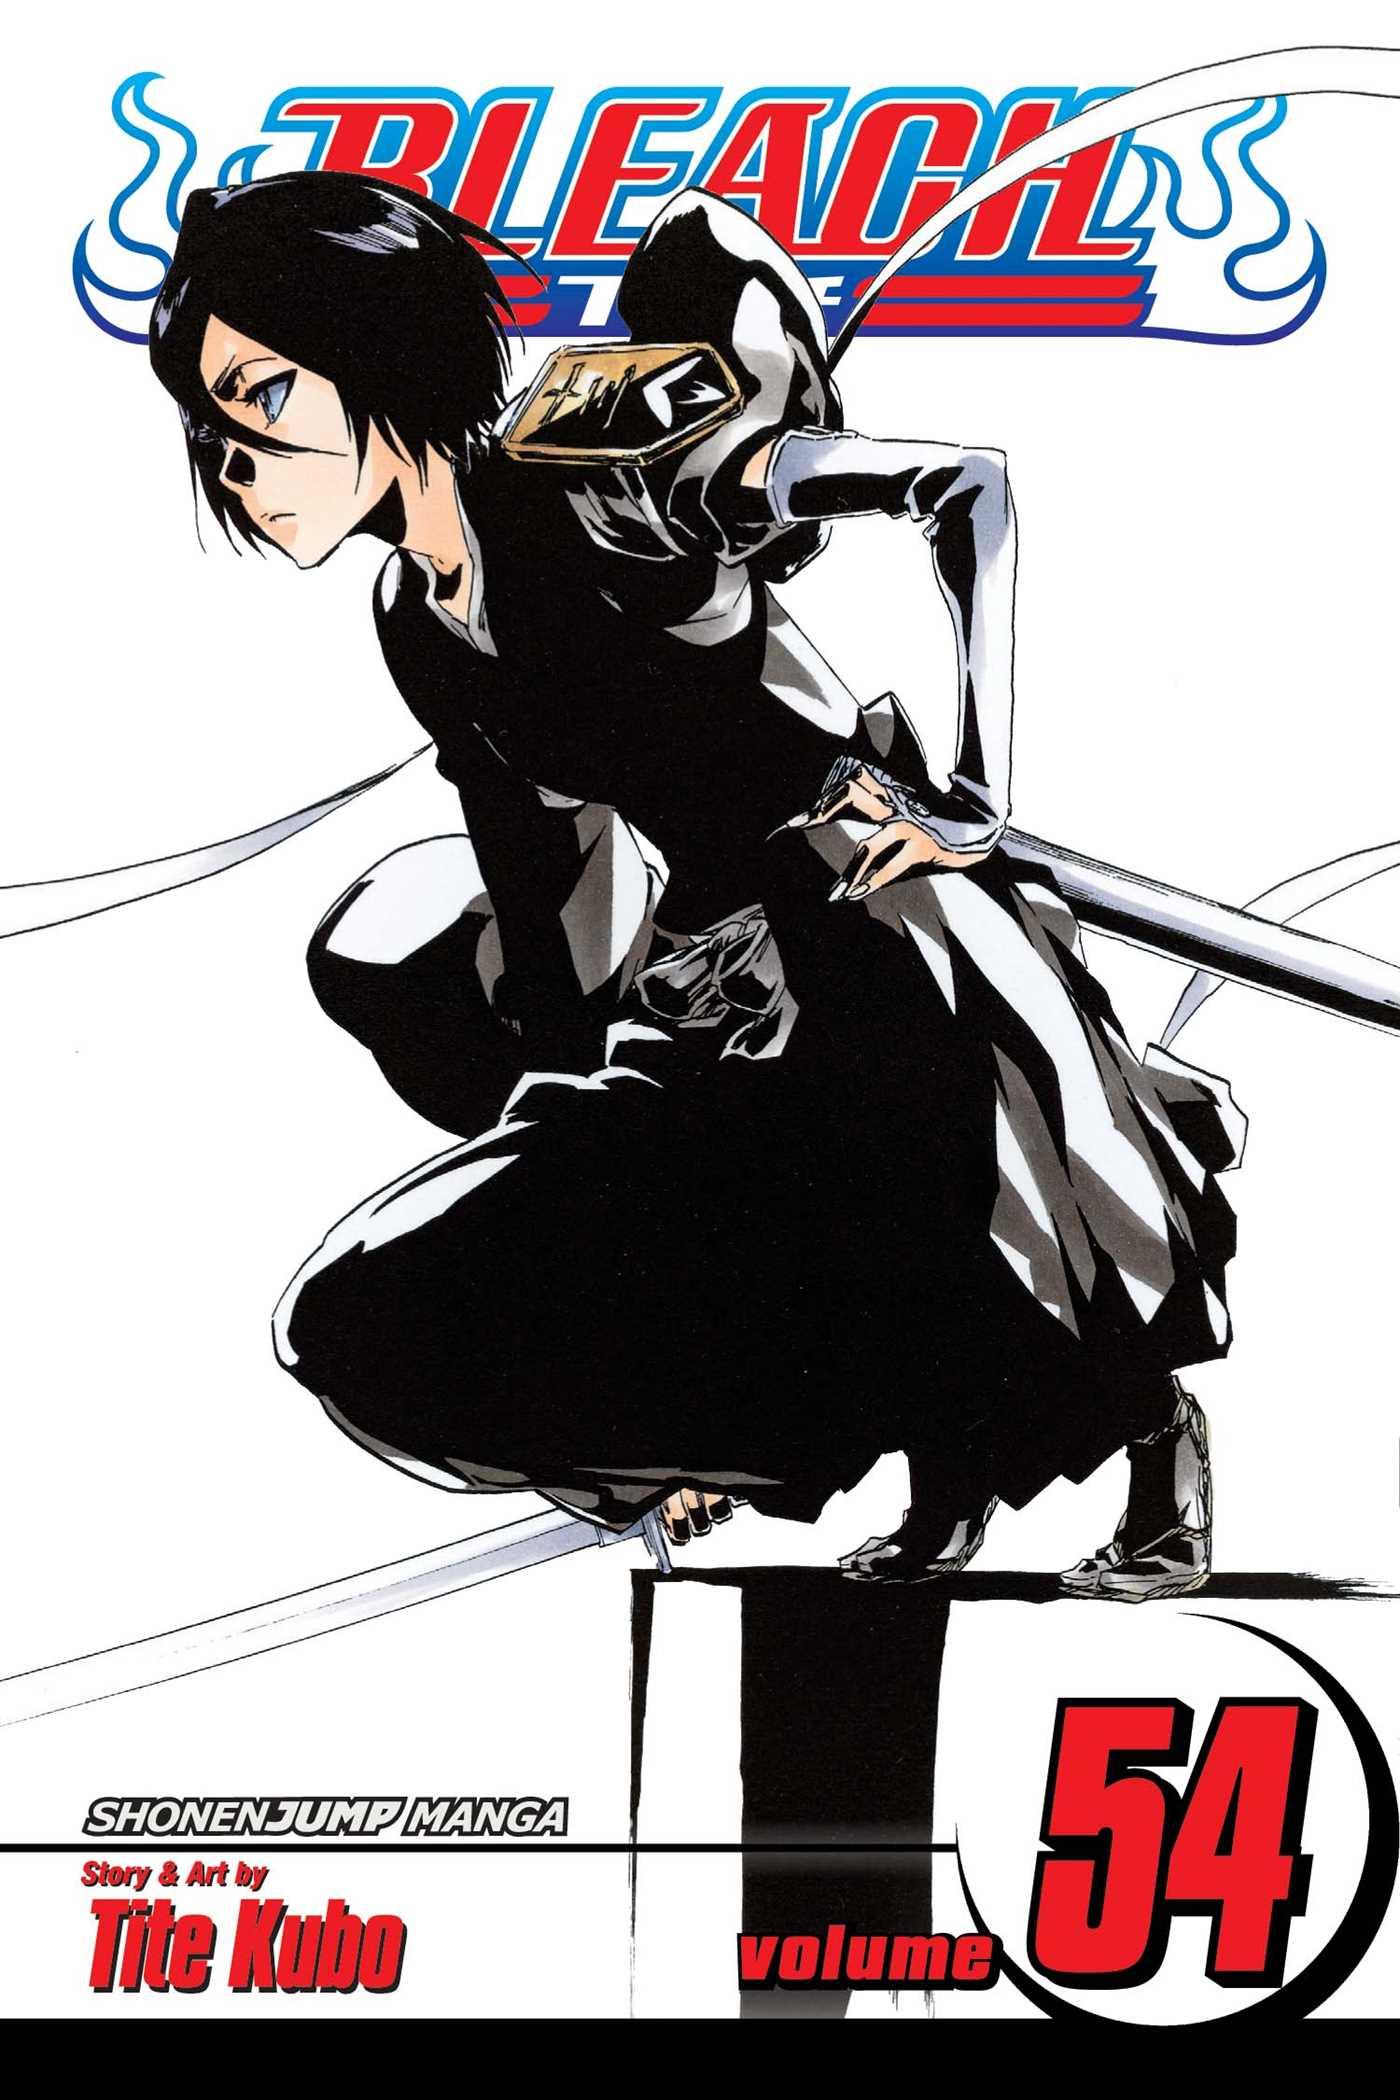 bleach manga volume 1 free download